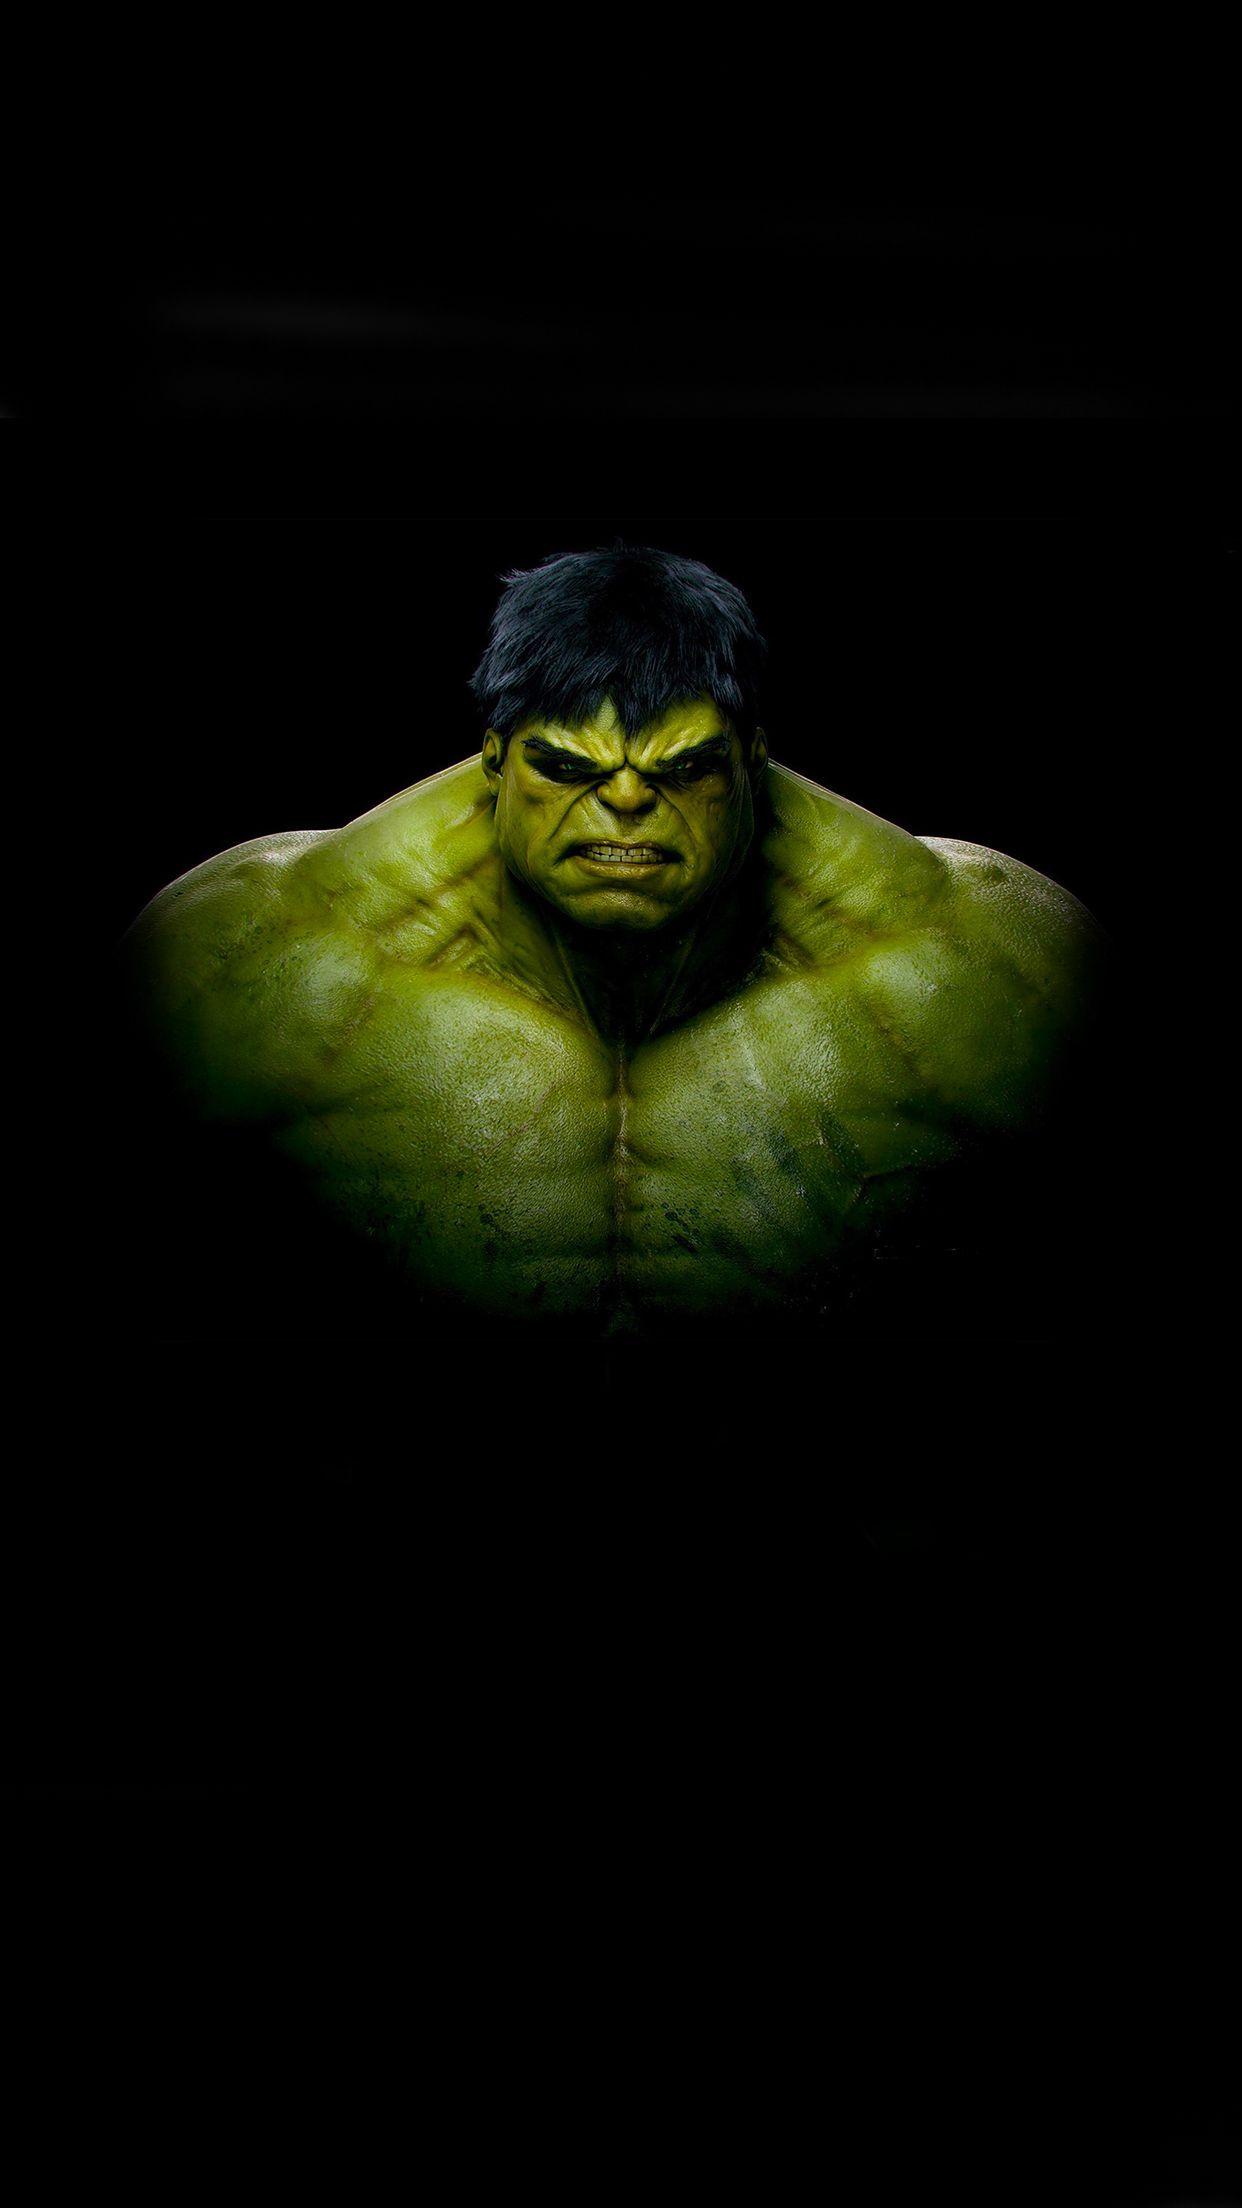 Hulk Iphone Hd Wallpapers Top Free Hulk Iphone Hd Backgrounds Wallpaperaccess Hulk Art Hulk Comic Marvel Superhero Posters